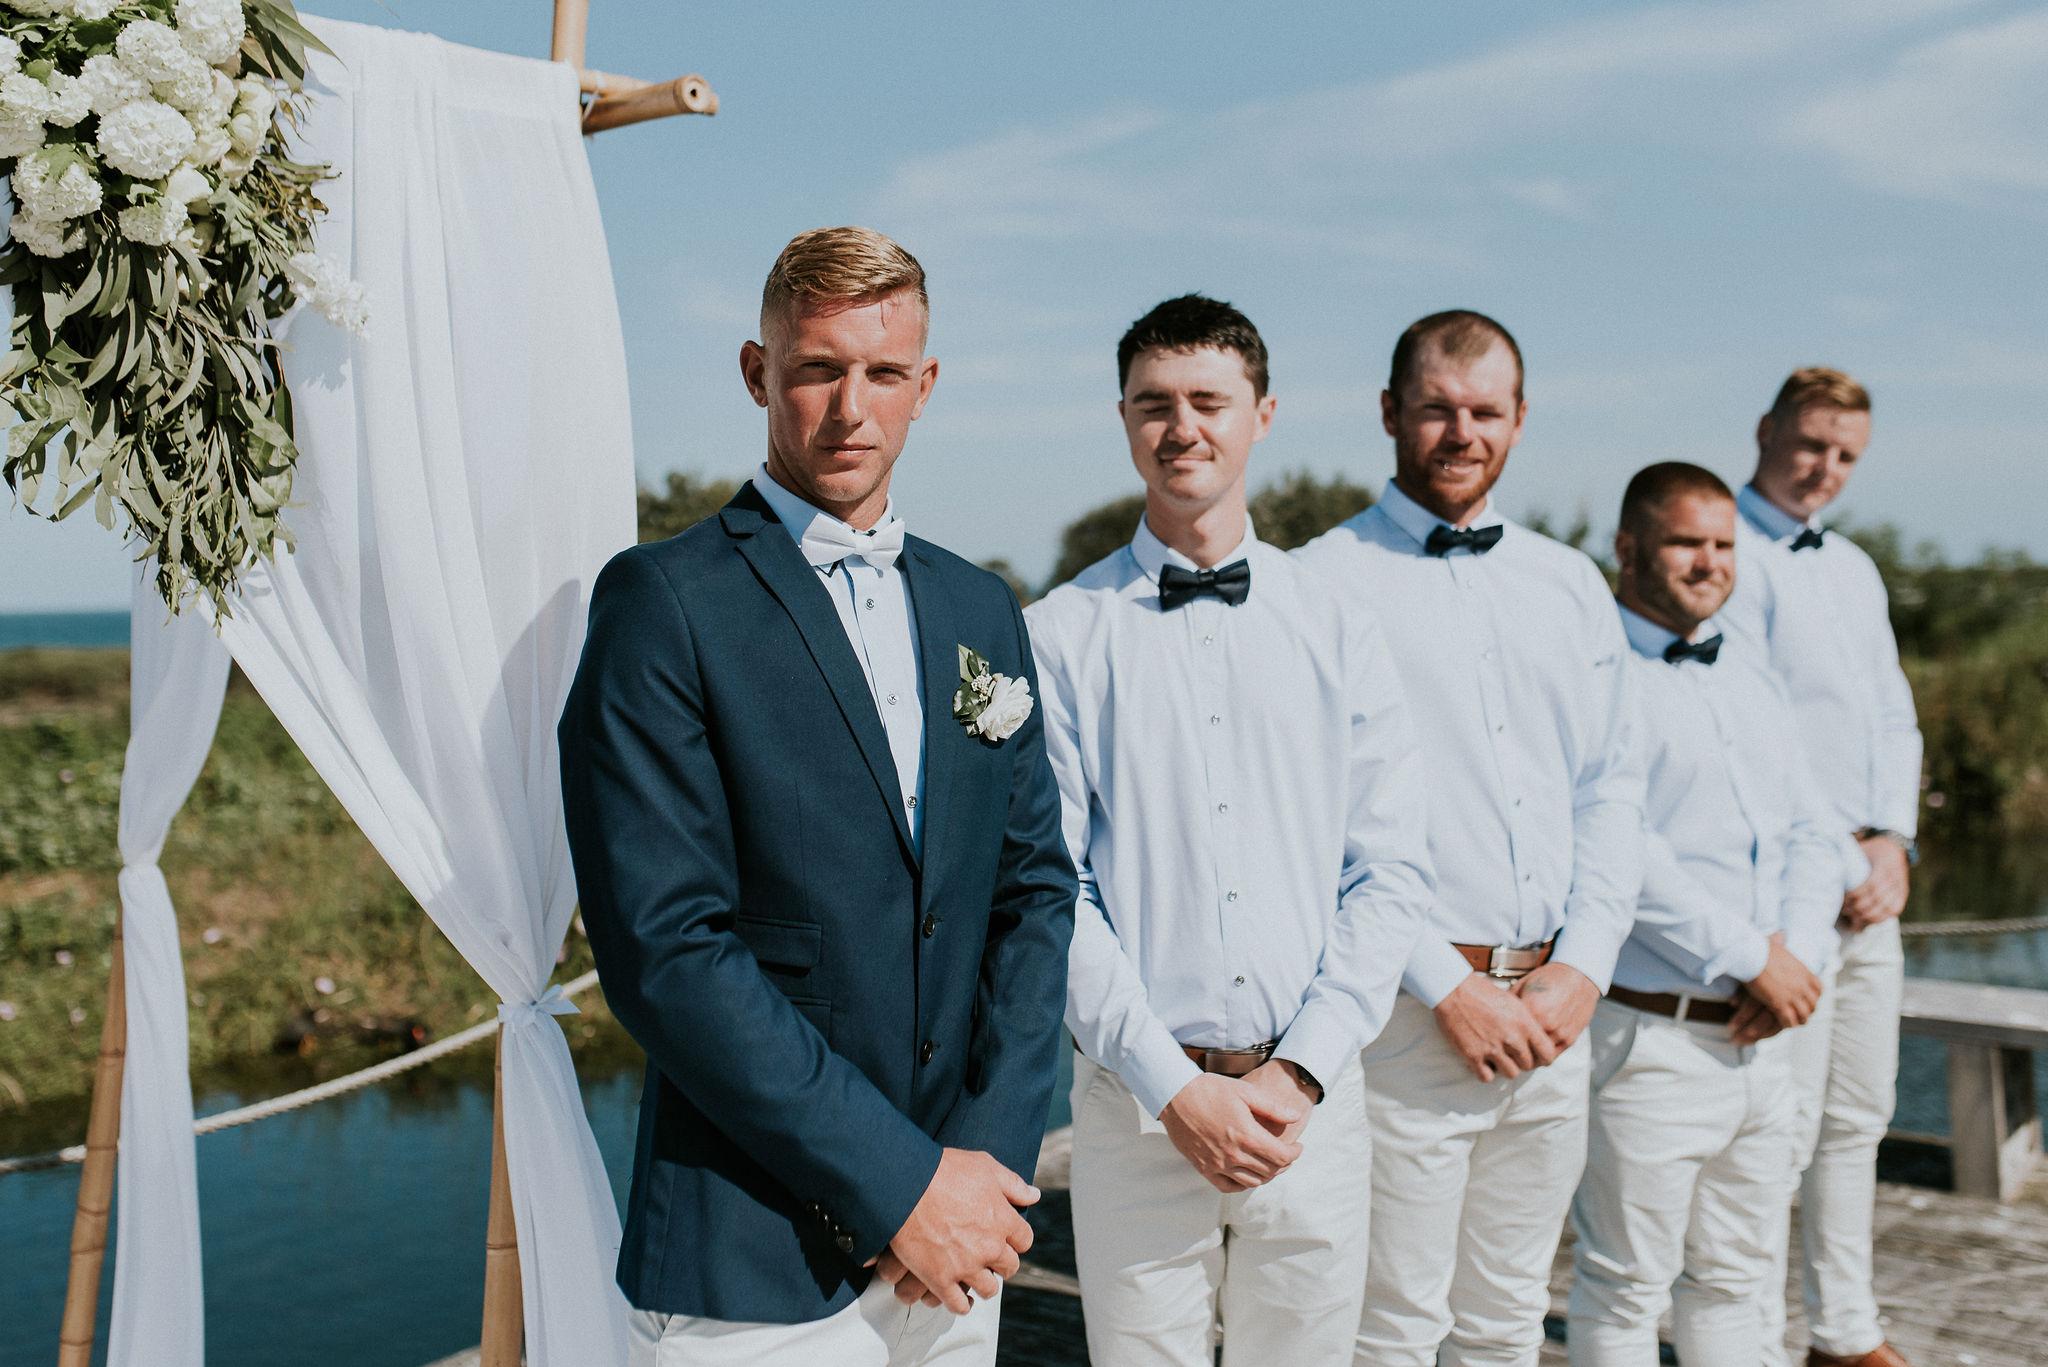 CAVES-BEACH-HOTEL-WEDDING-PATTEN-352.jpg